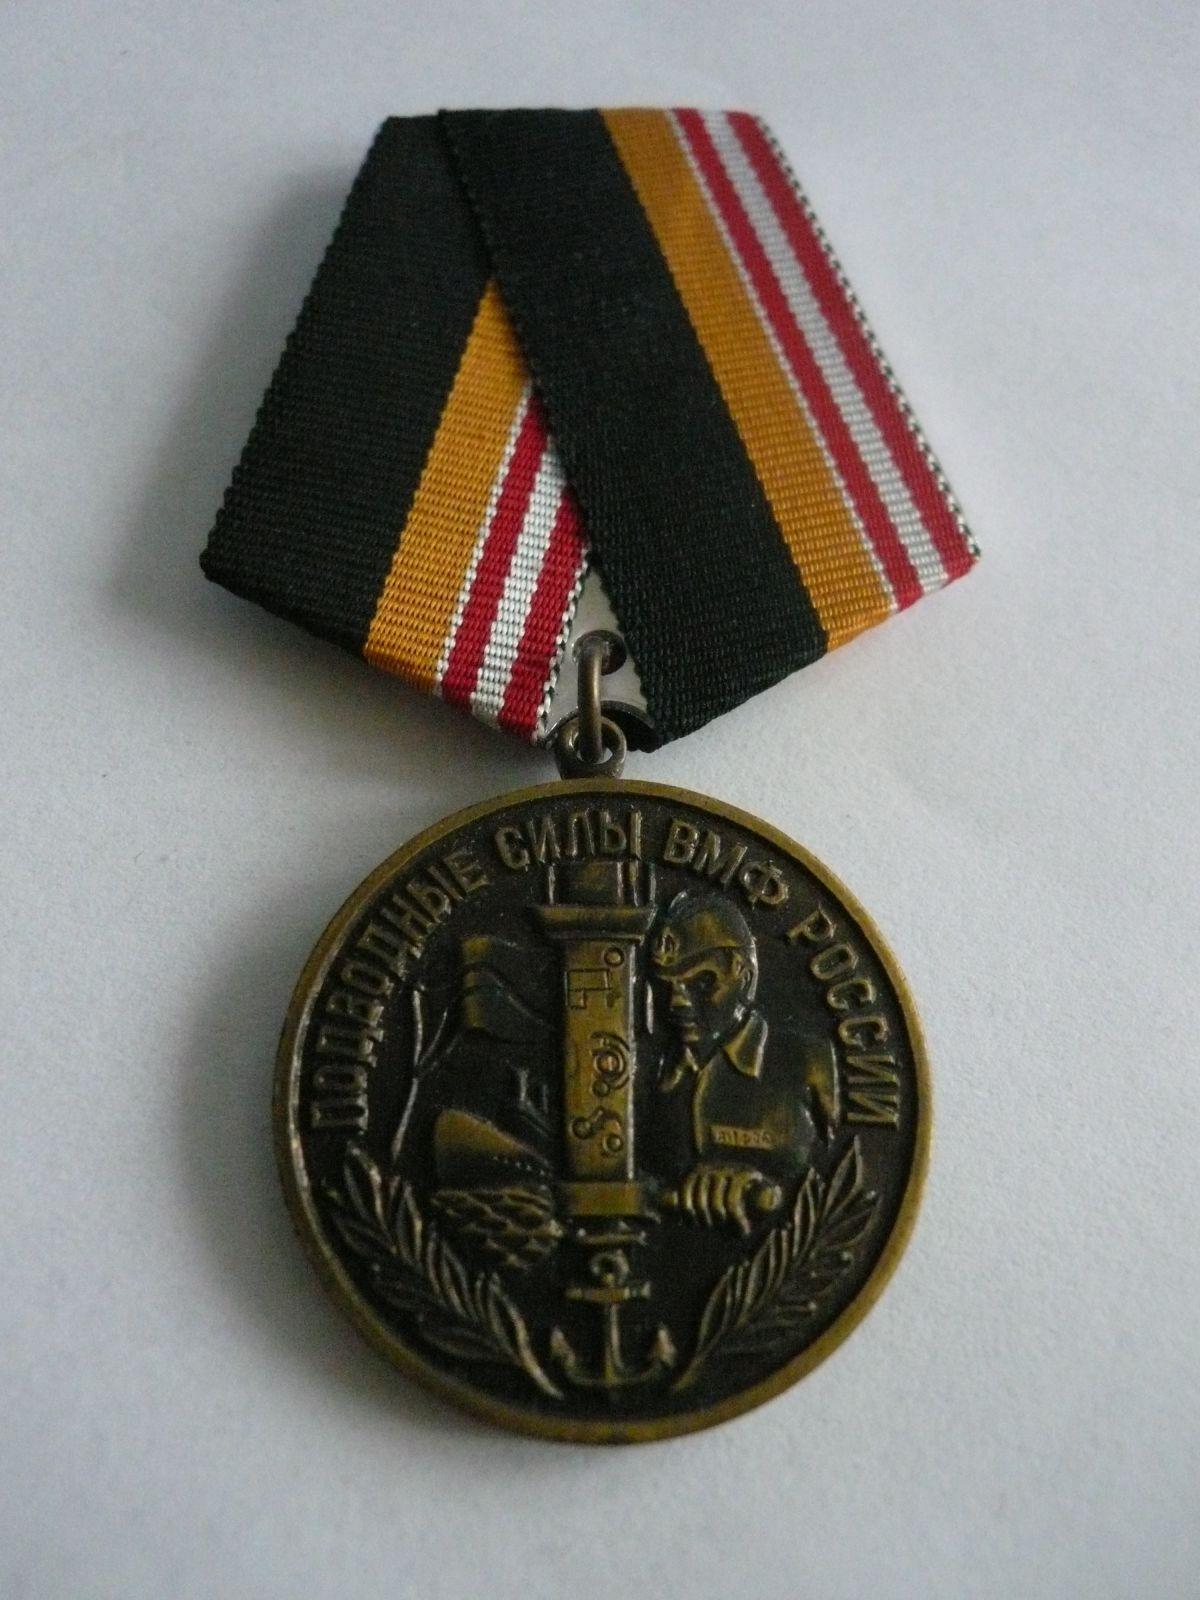 Za službu u ponorkového vojska - Rusko